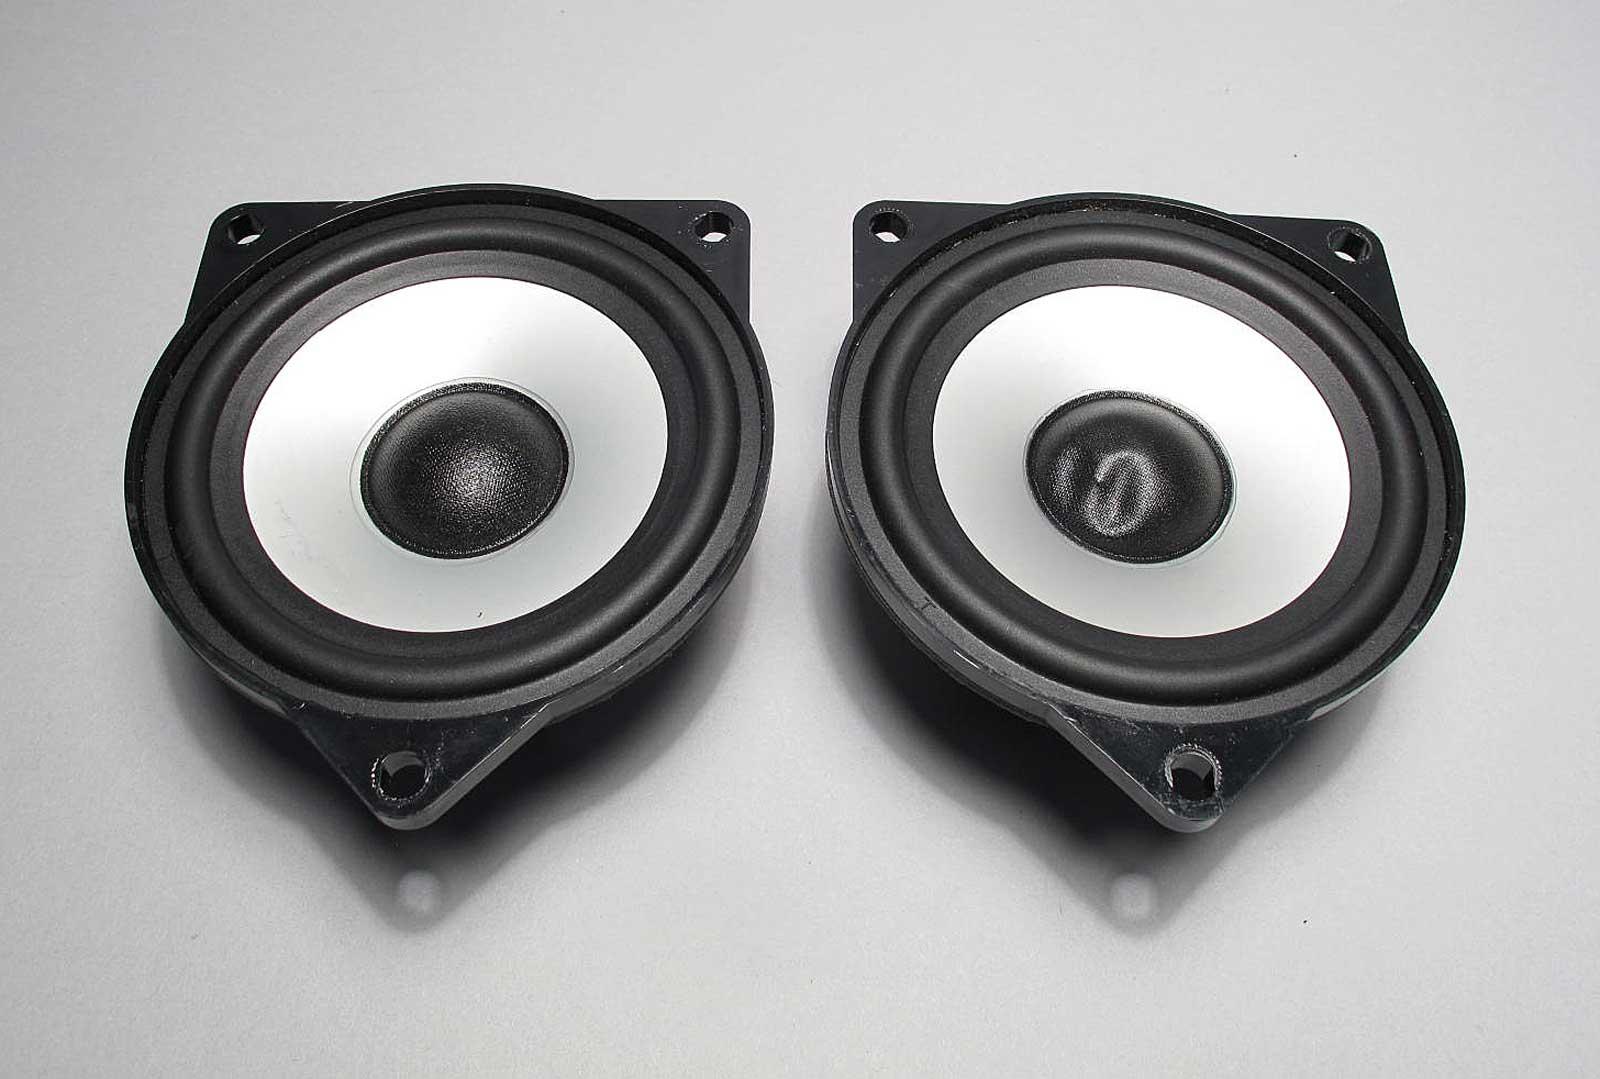 Bmw Z4 X3 Top Hifi Dsp Audio Mid Range Door Speaker Driver Pair 2003 2008 Used Ebay